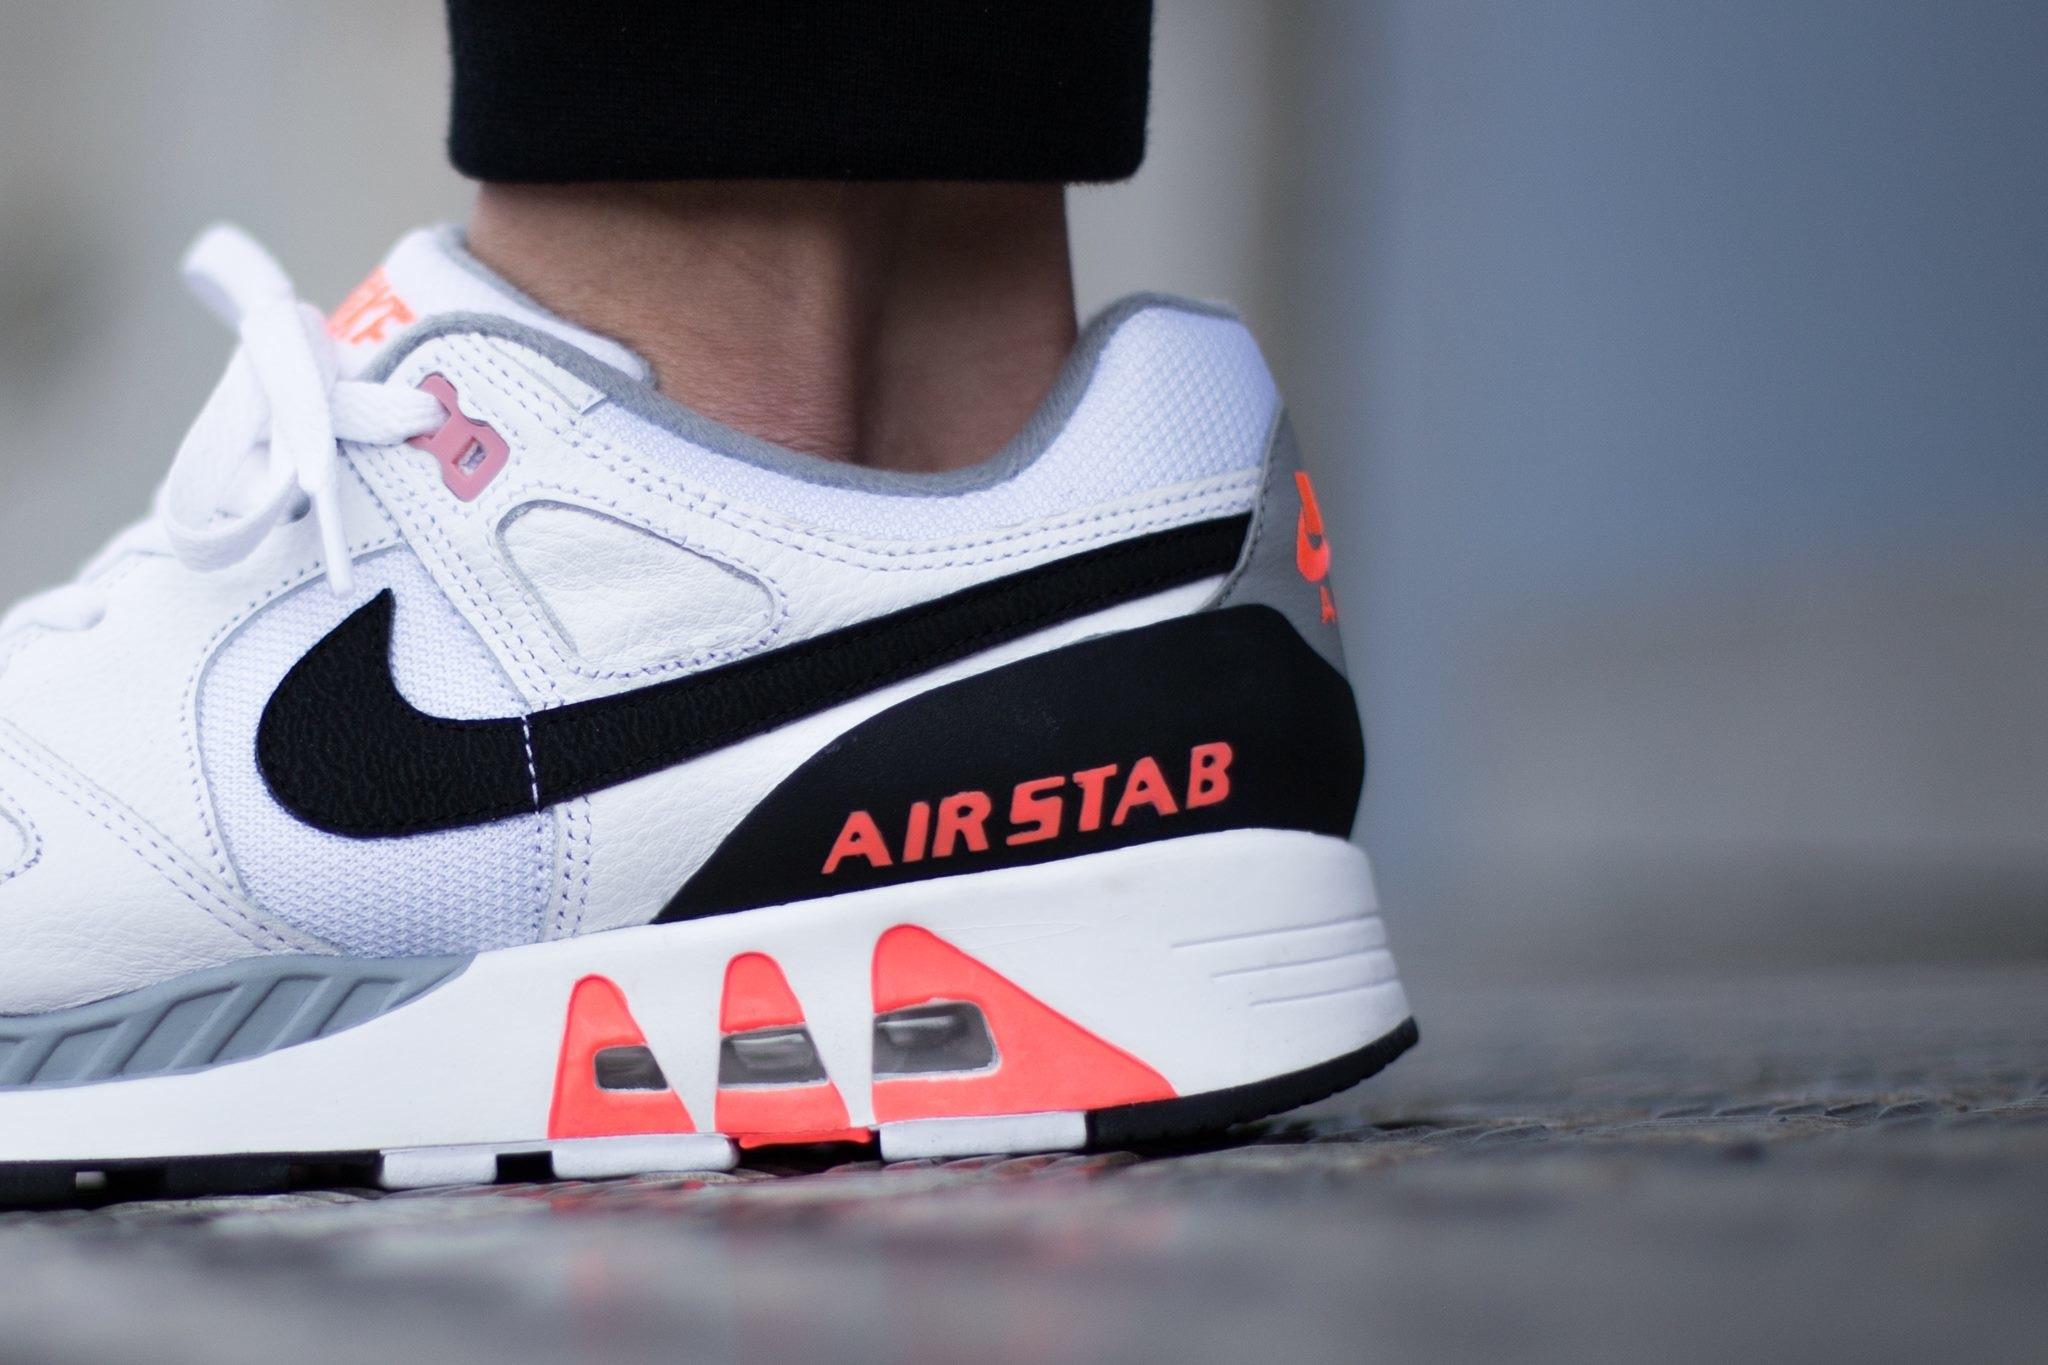 Nike-Air-Stab-Infrared-4